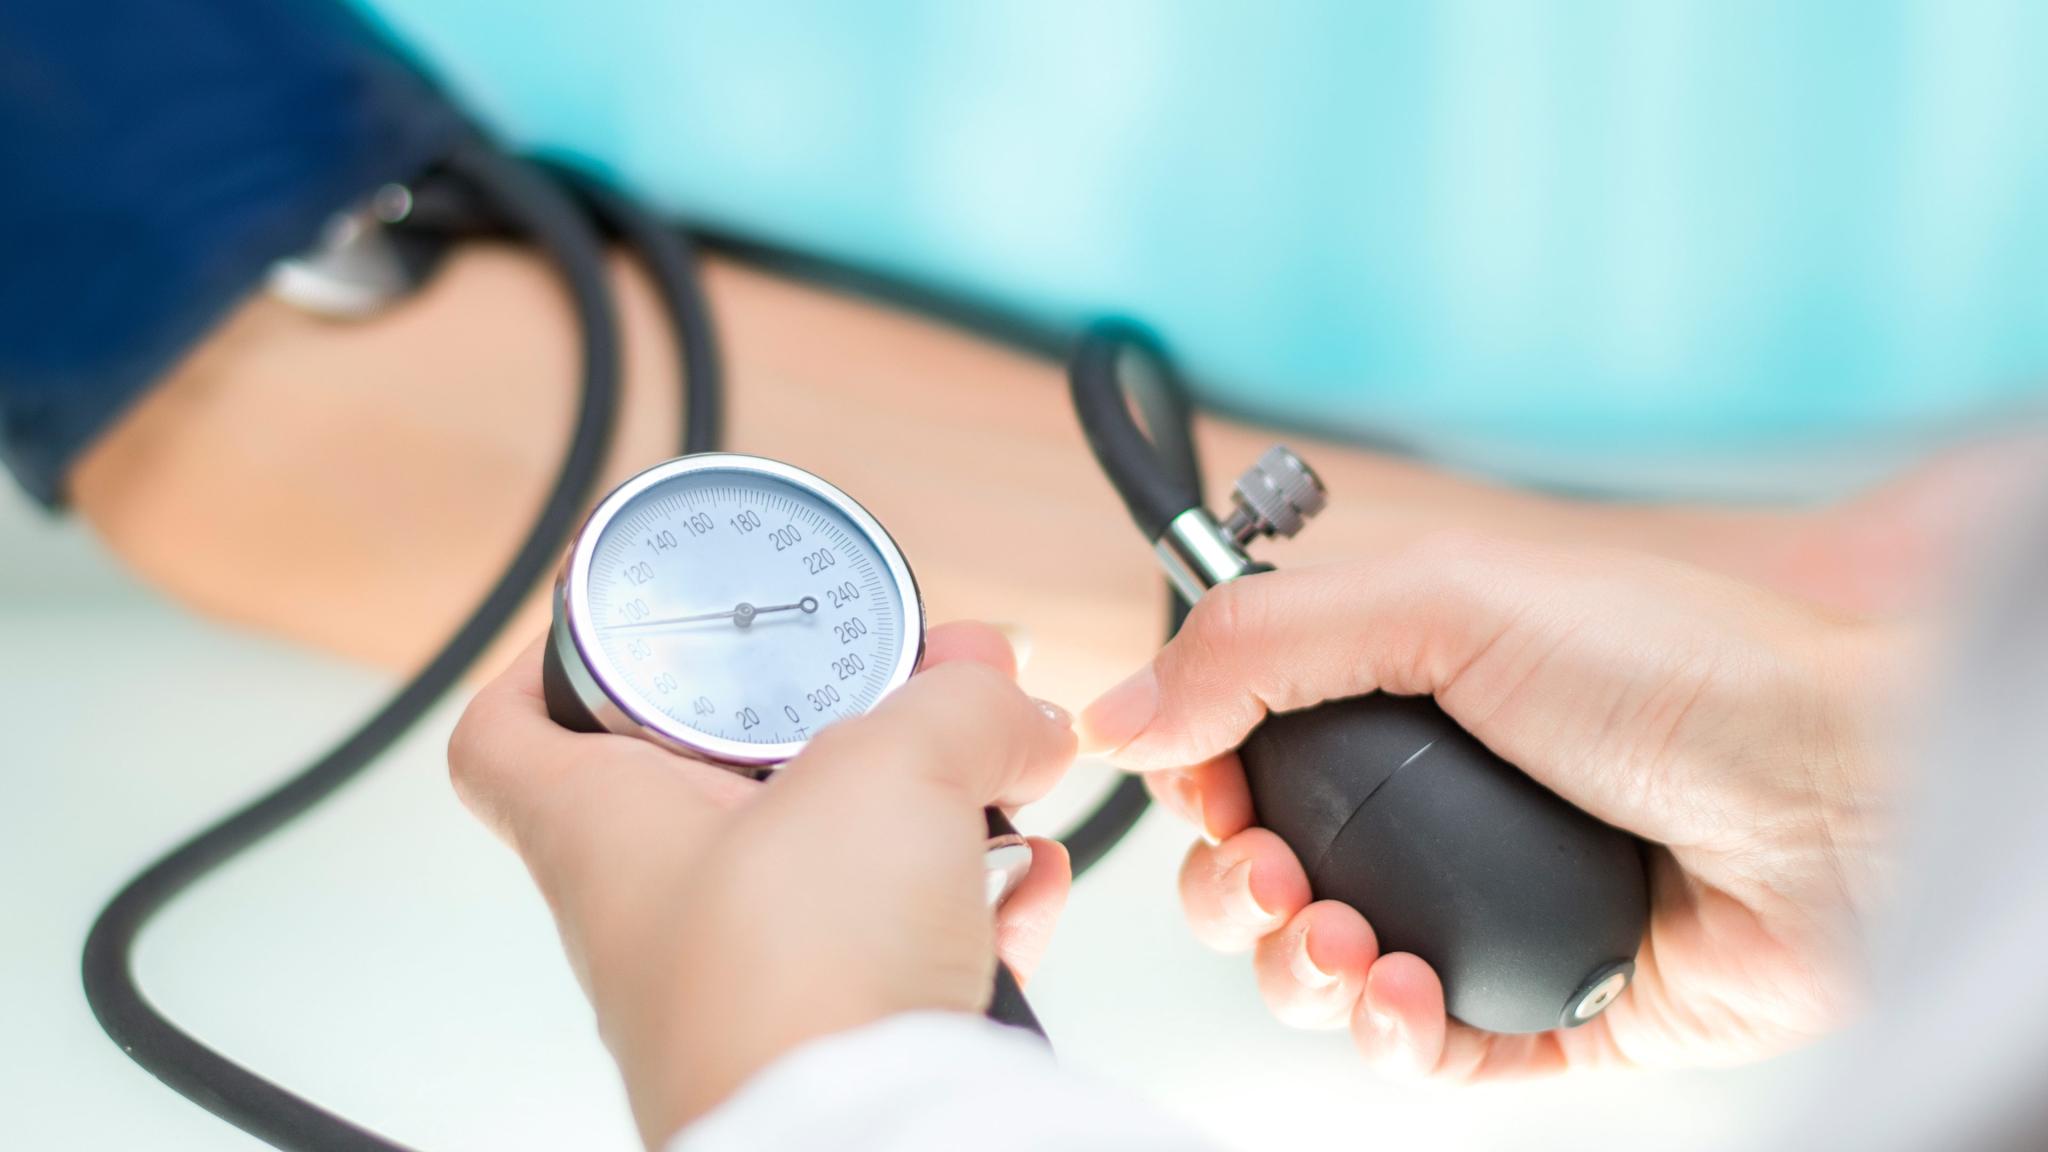 ambulancia magas vérnyomás standard